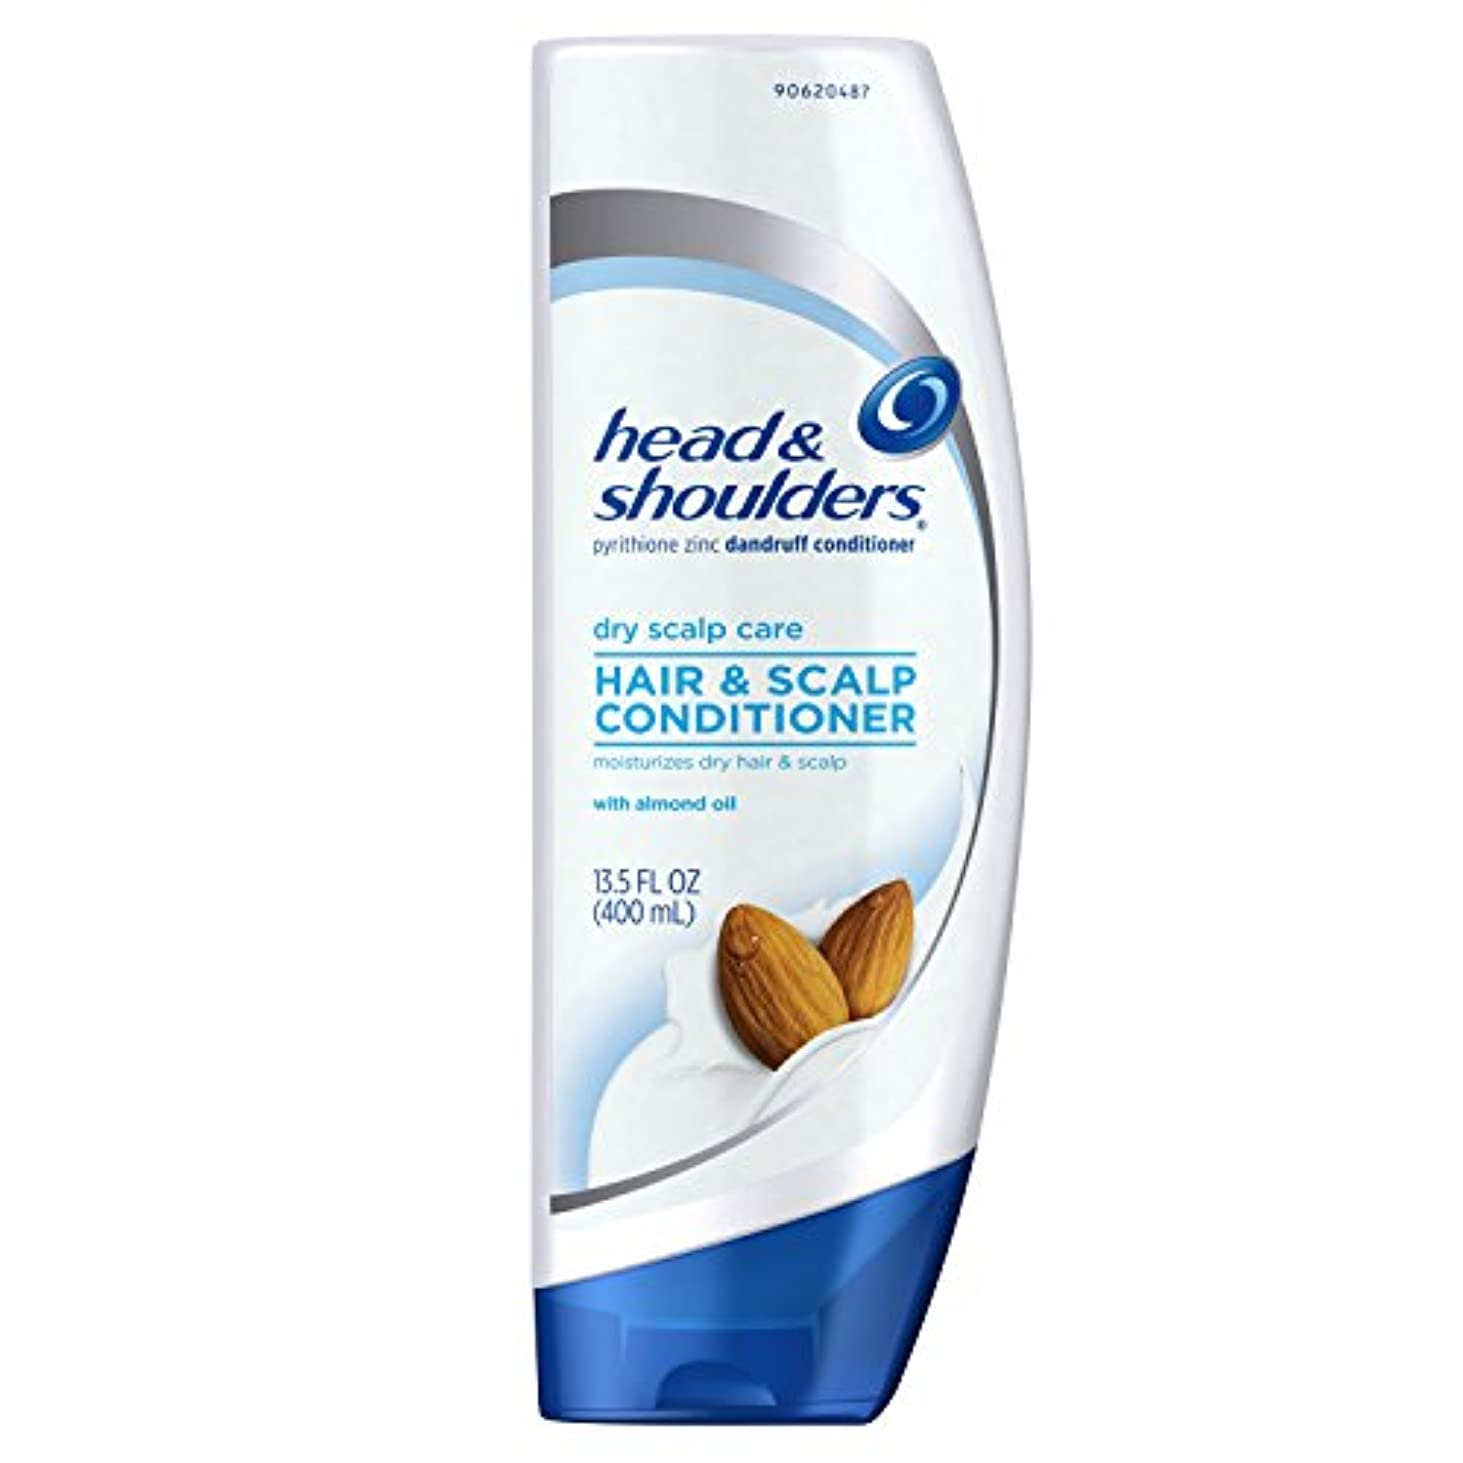 Head And Shoulders Dry Scalp Dandruff Hair Conditioner - 13.5 Oz (並行輸入品)